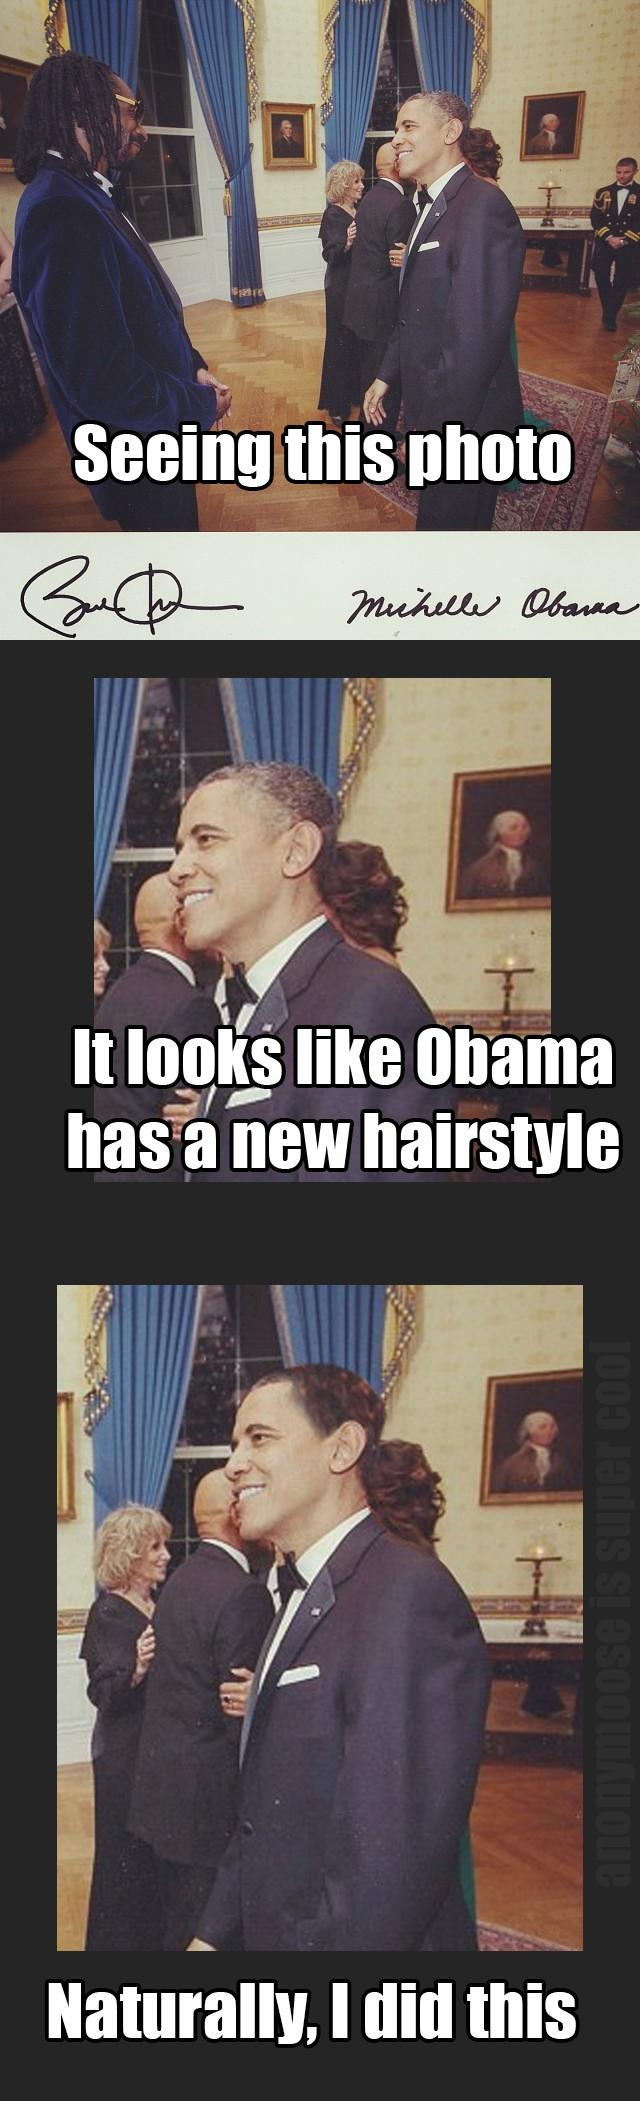 Obama got a new weave. Watching snakes poop is very very odd. www.youtube.com/watch?v=-eqVjdKtD44 ! I GOT THE BACKGROUND COLOUR WRONG!.. OG Obama got a new weave Watching snakes poop is very odd www youtube com/watch?v=-eqVjdKtD44 ! I GOT THE BACKGROUND COLOUR WRONG! OG